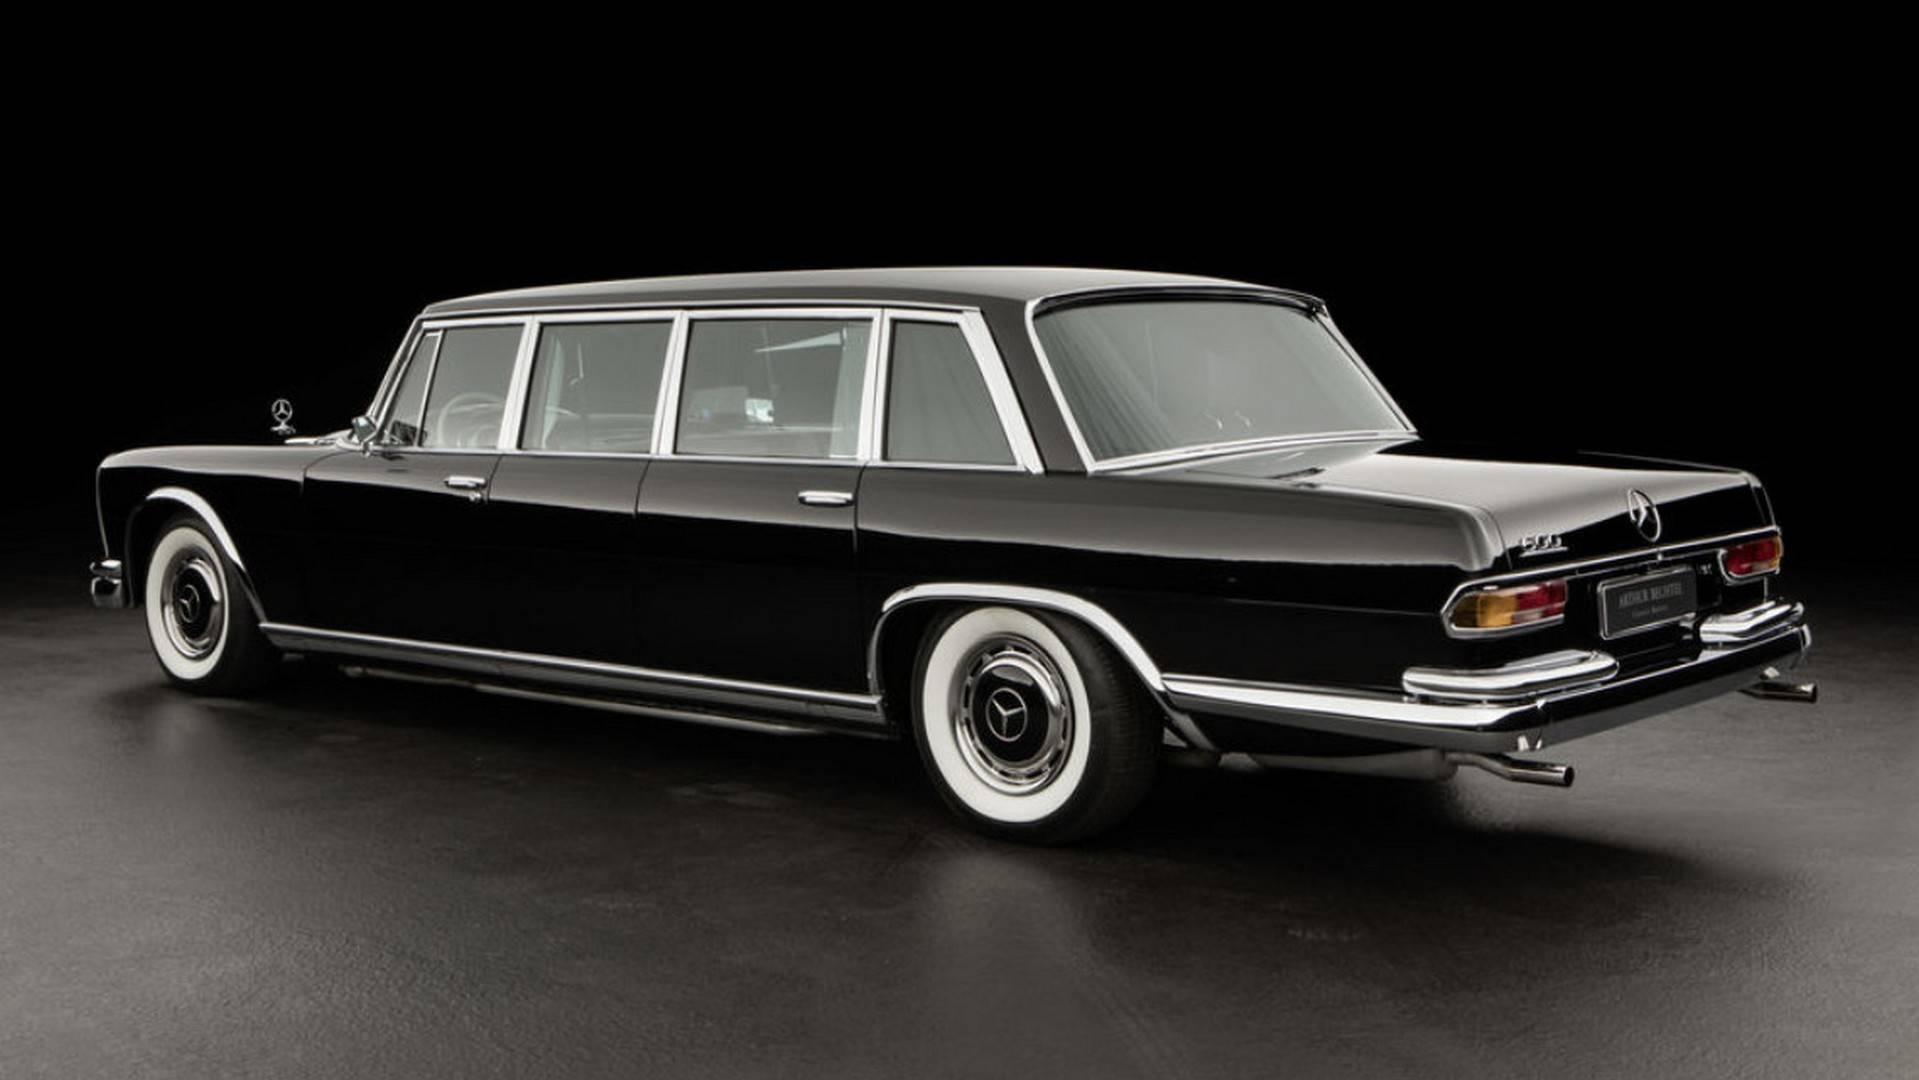 Photo of Μία Mercedes Pullman του 1969 θα πωληθεί για περισσότερες από 800.000 ευρώ!